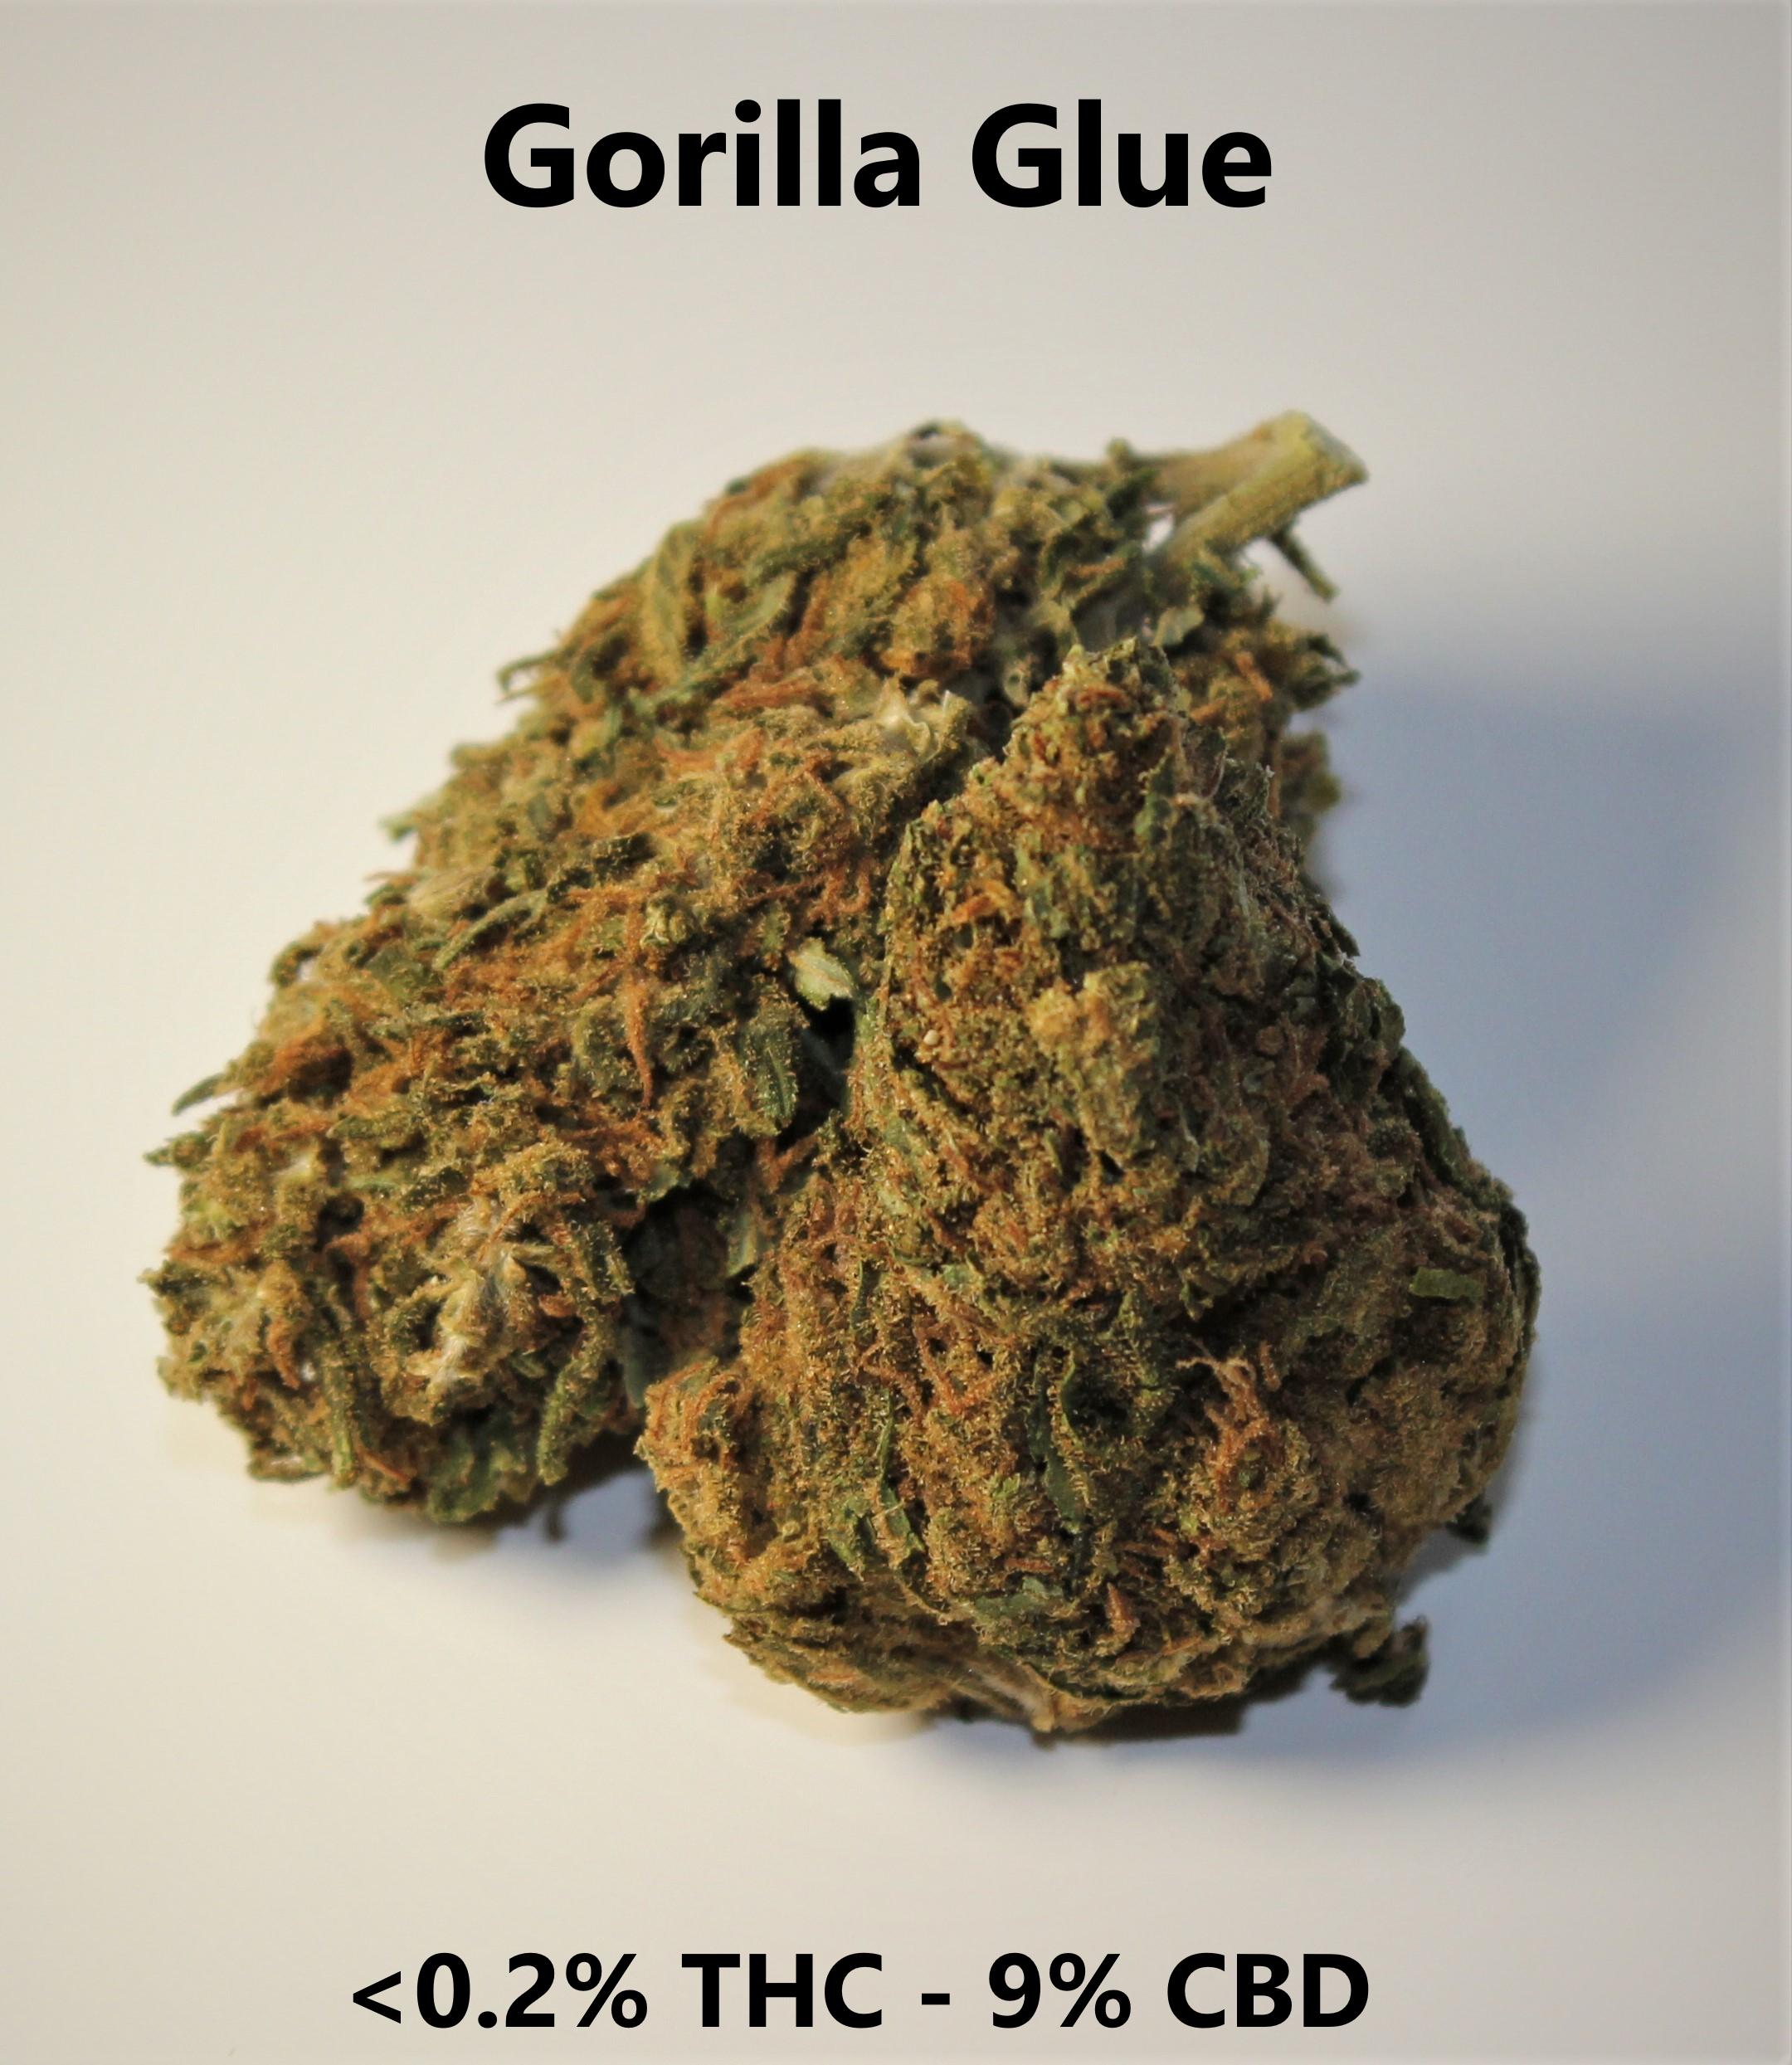 Gorilla Glue <0.2% THC - 9% CBD